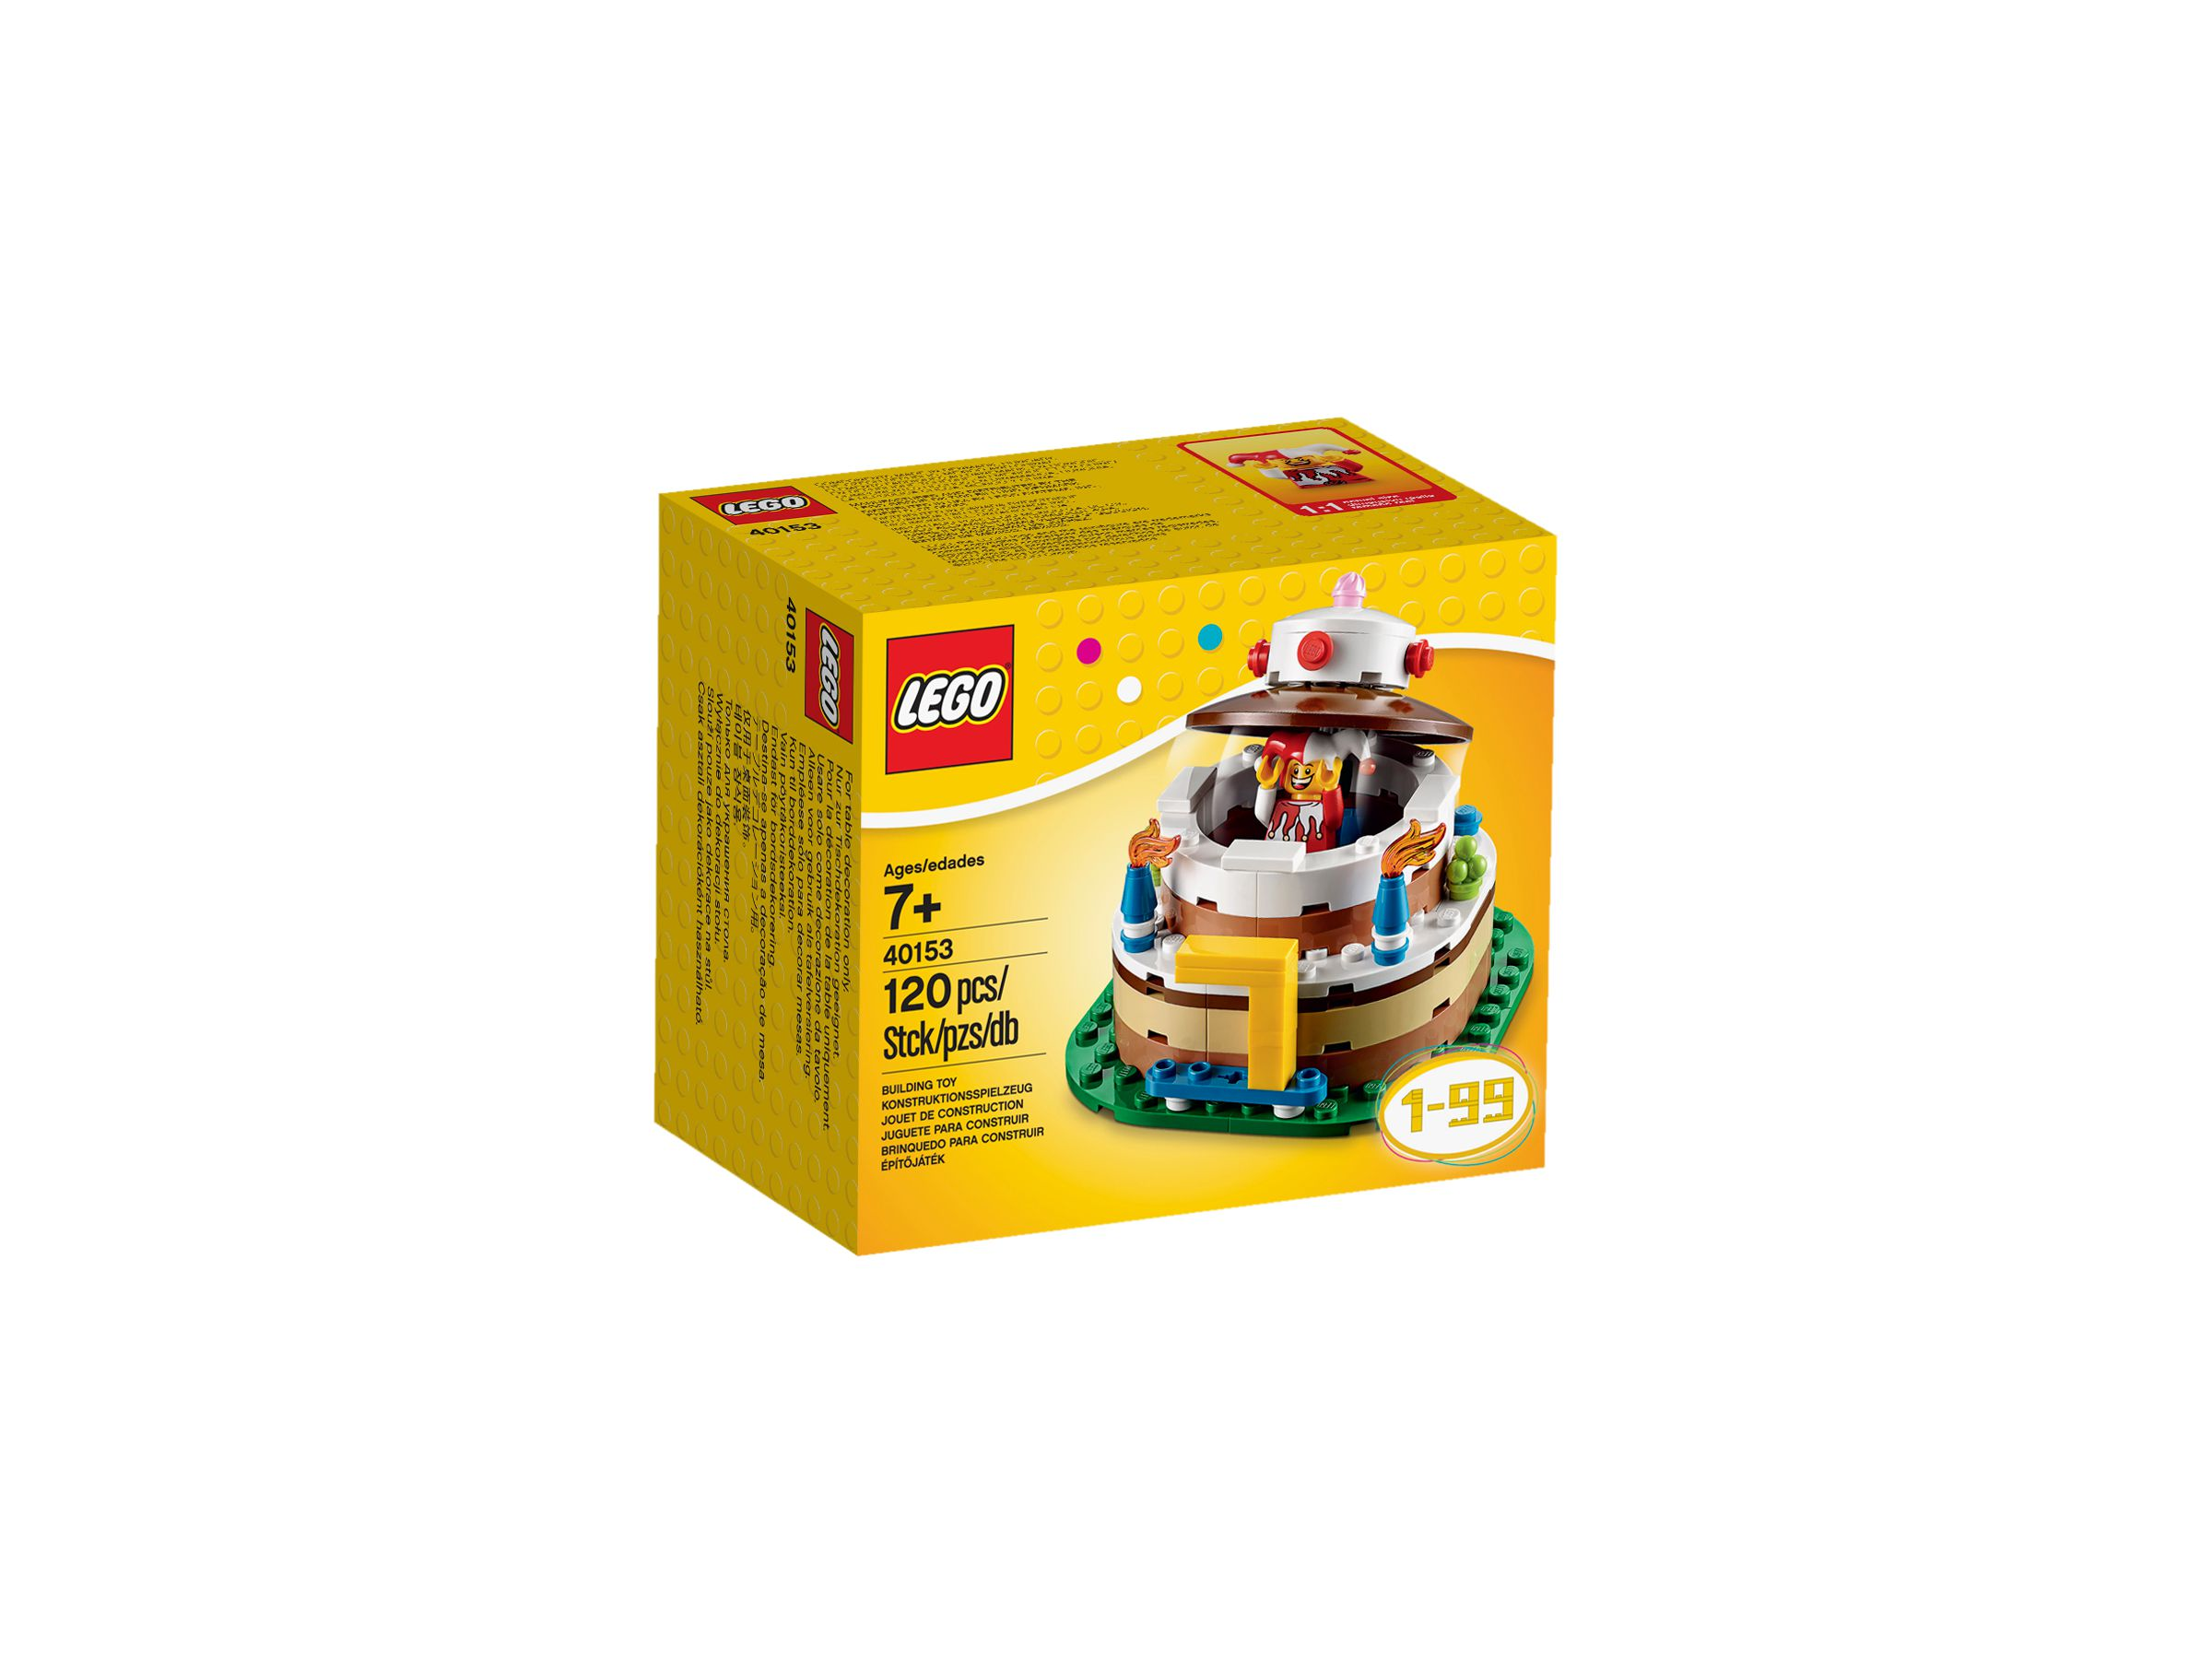 LEGO Seasonal 40153 Geburtstagstischdekoration Alt1